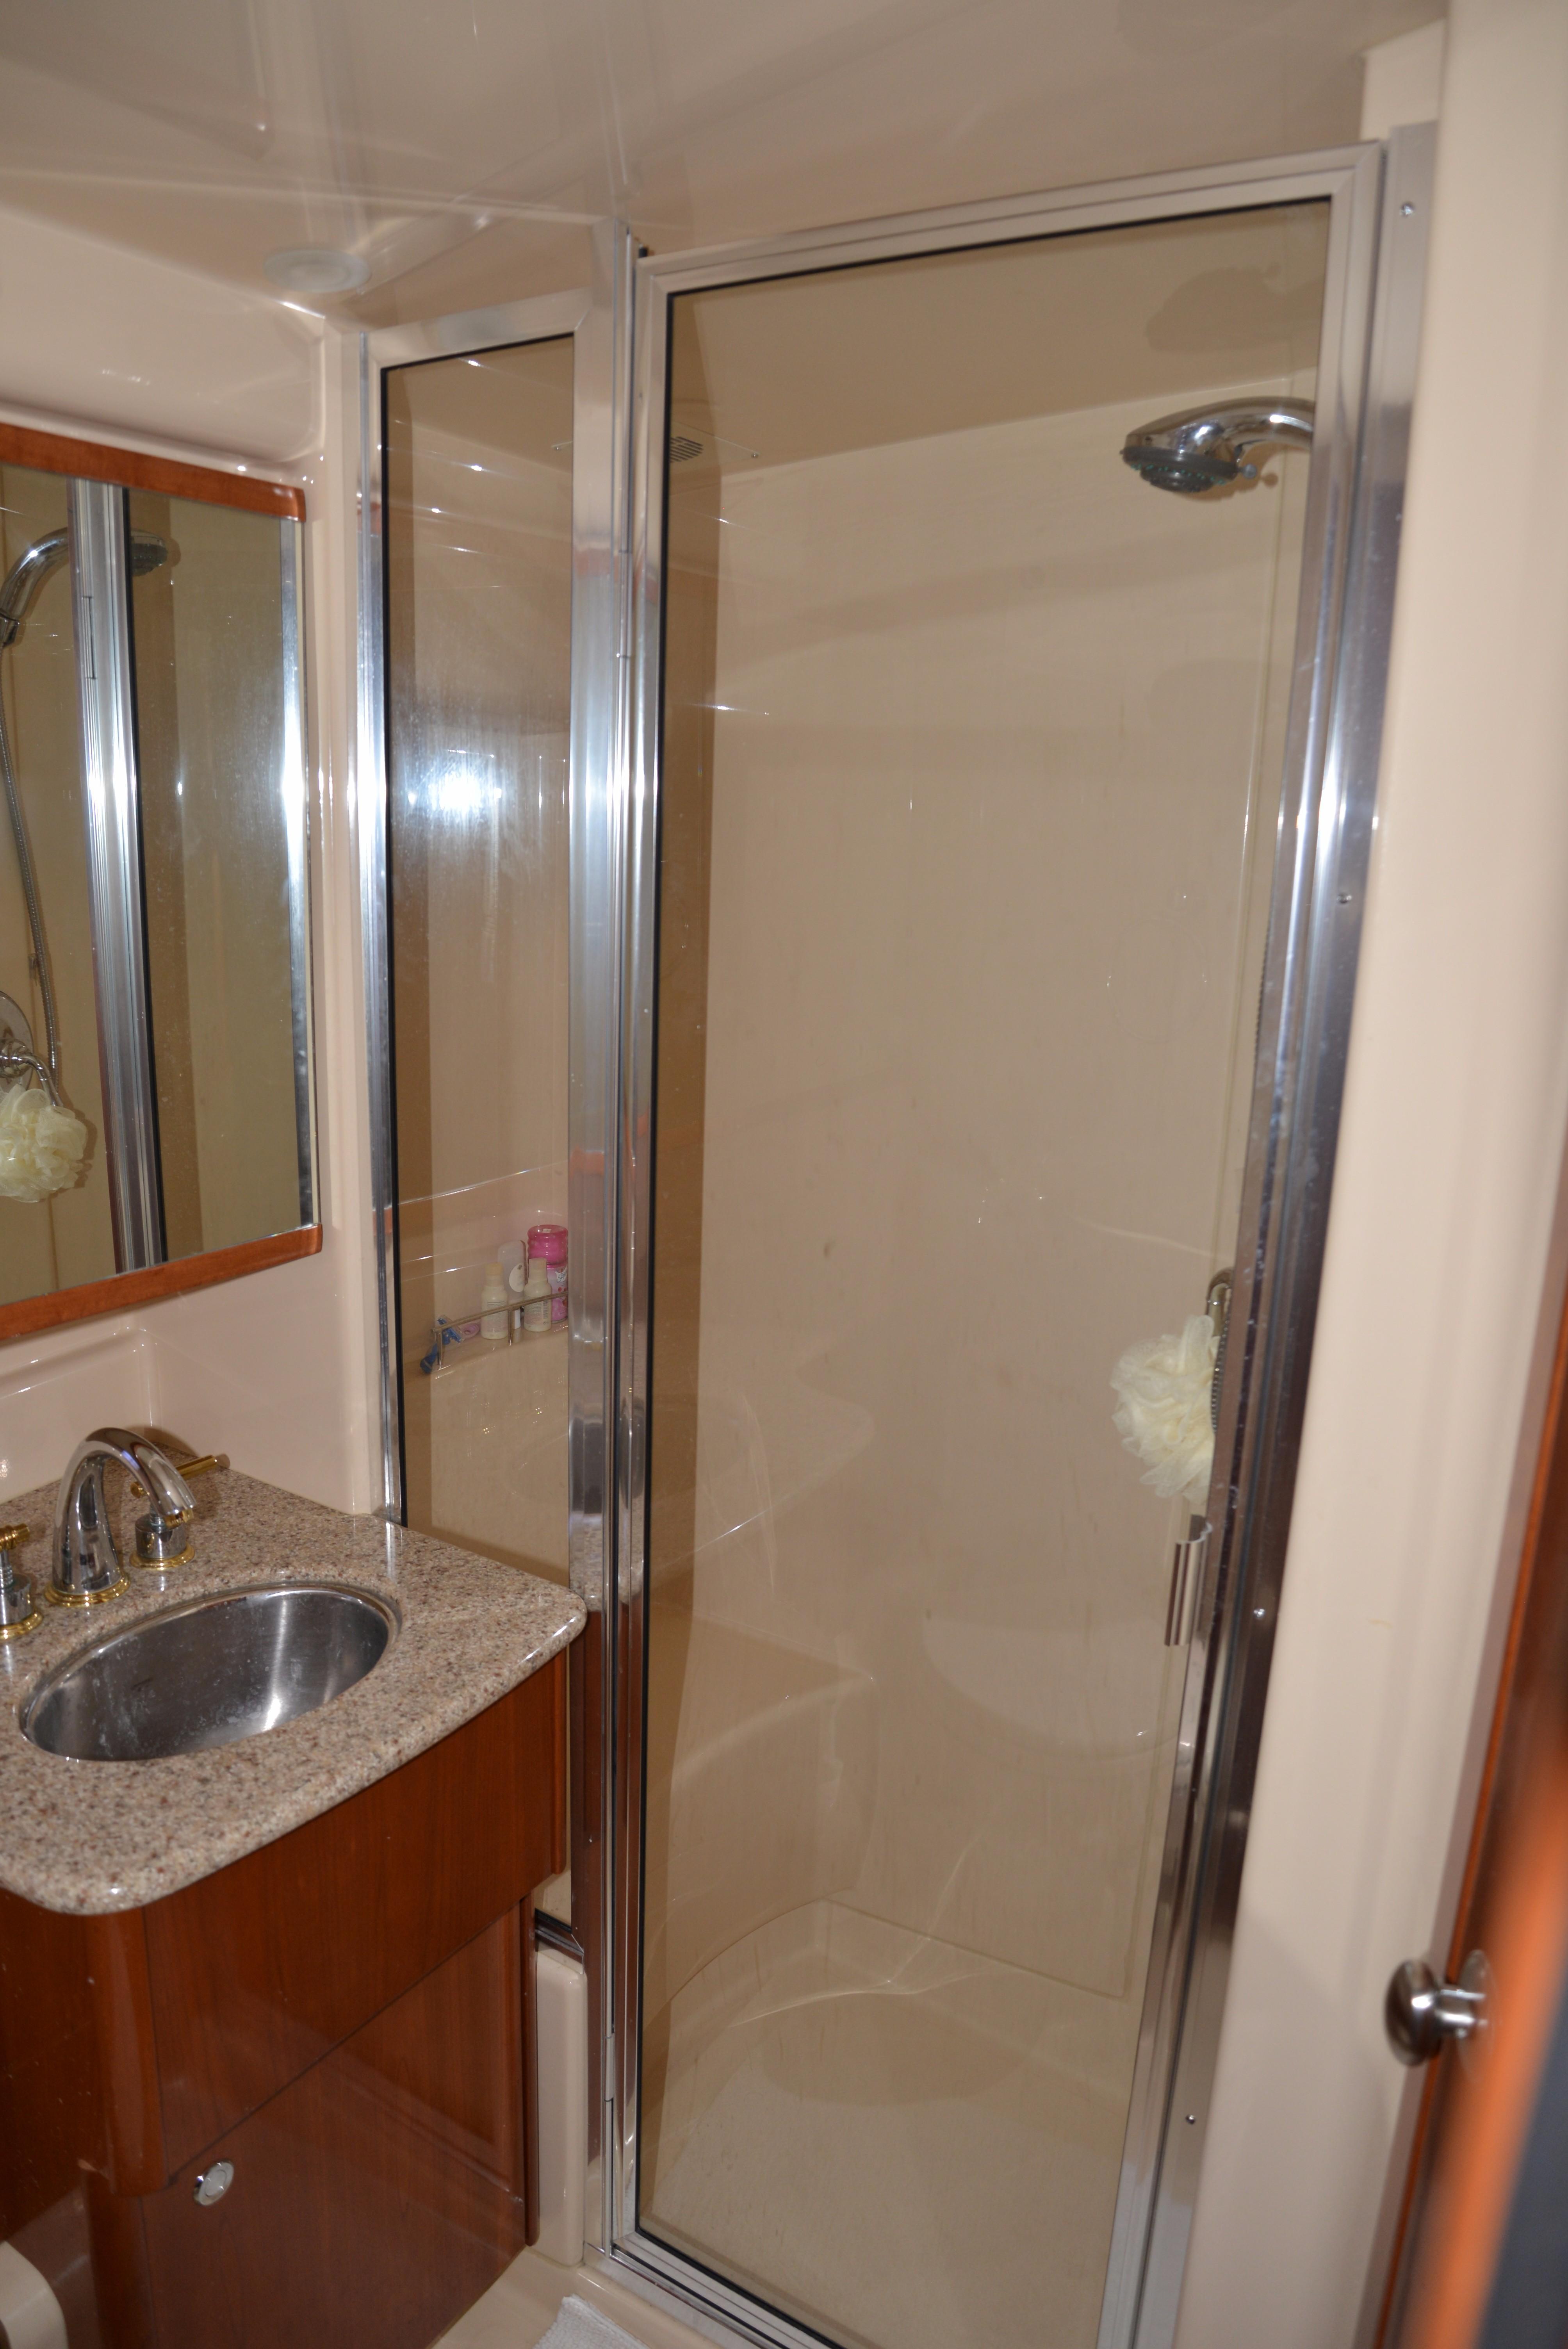 door product splendor shower festoon colors linen osc cape may doors panels catalog info valance available